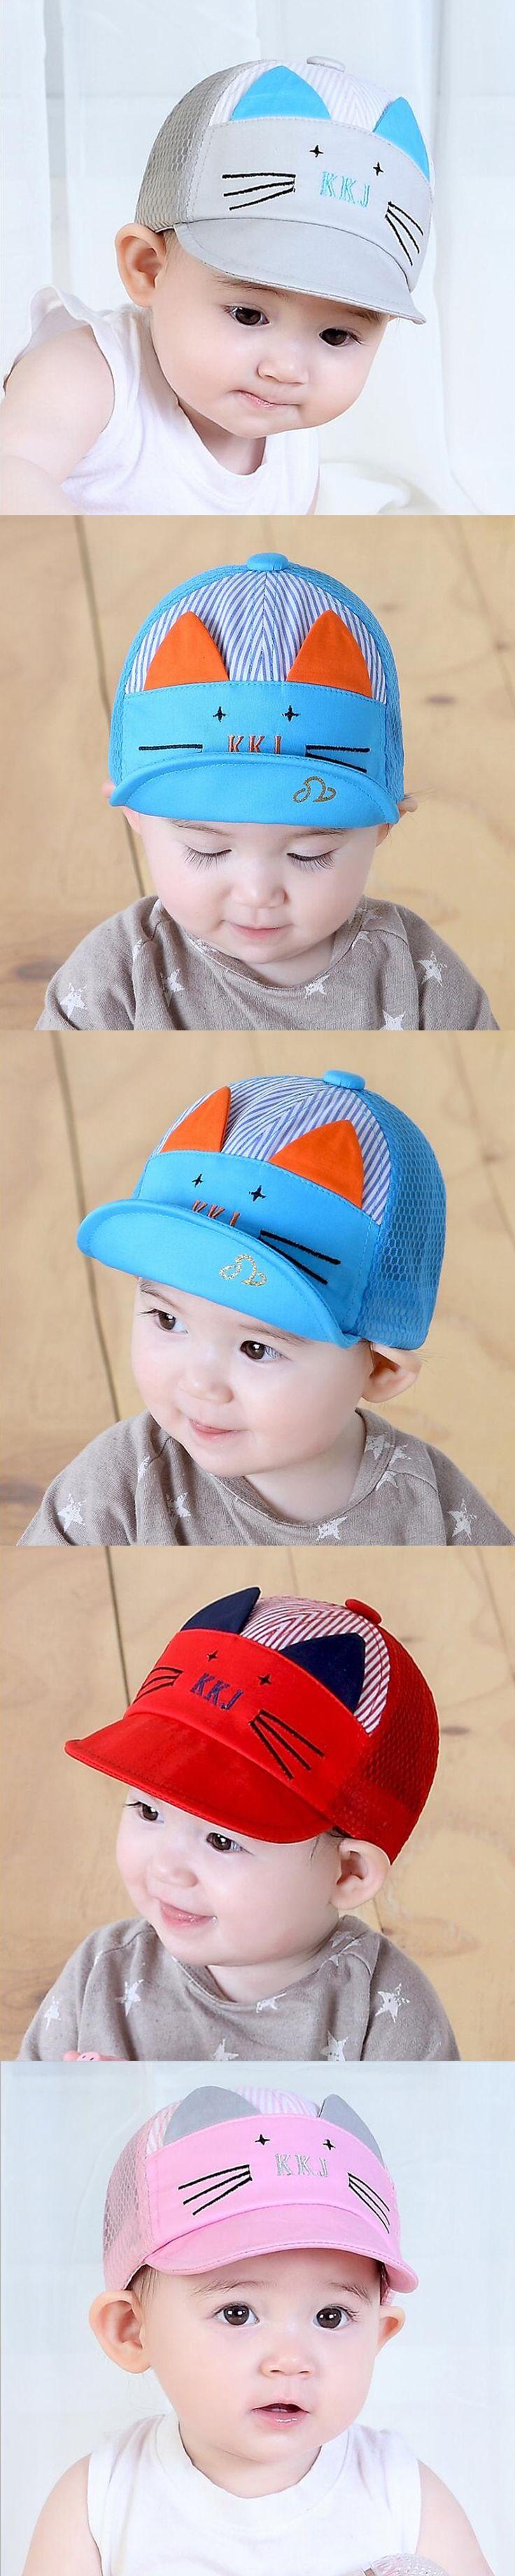 Cute Cartoon Cat Hat Kids Baseball Cap Infant Boy Girl Soft Cotton Caps Infant Visors Sun Hat Summer Children Mesh Cap